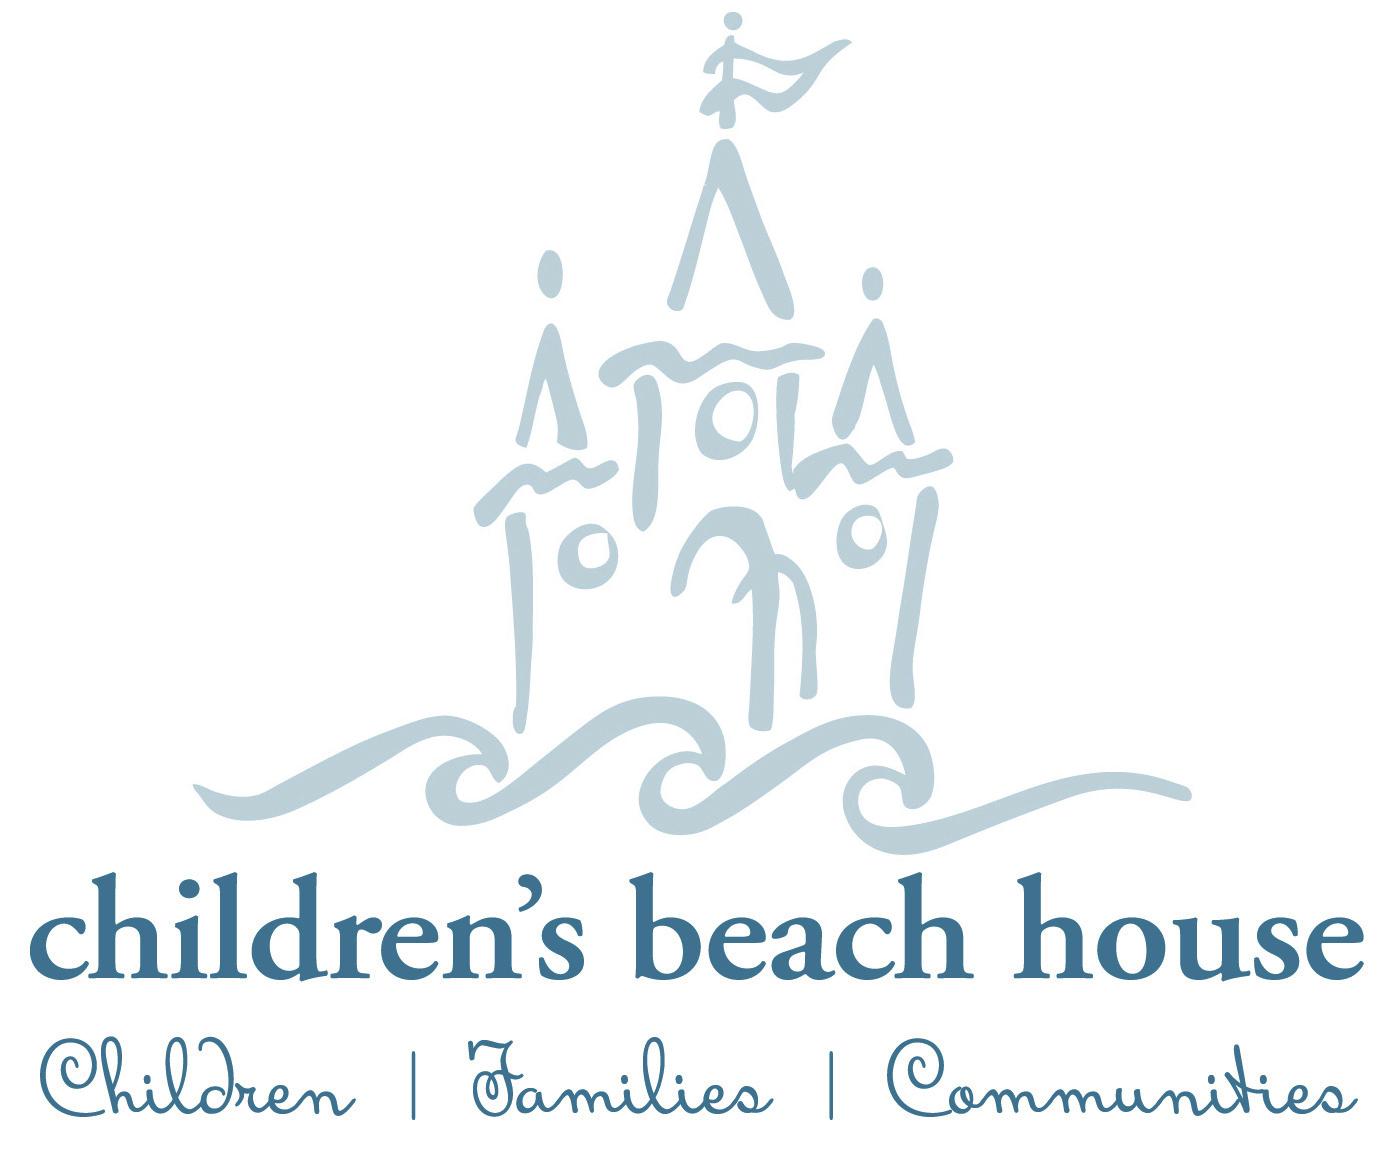 Children's Beach House logo.